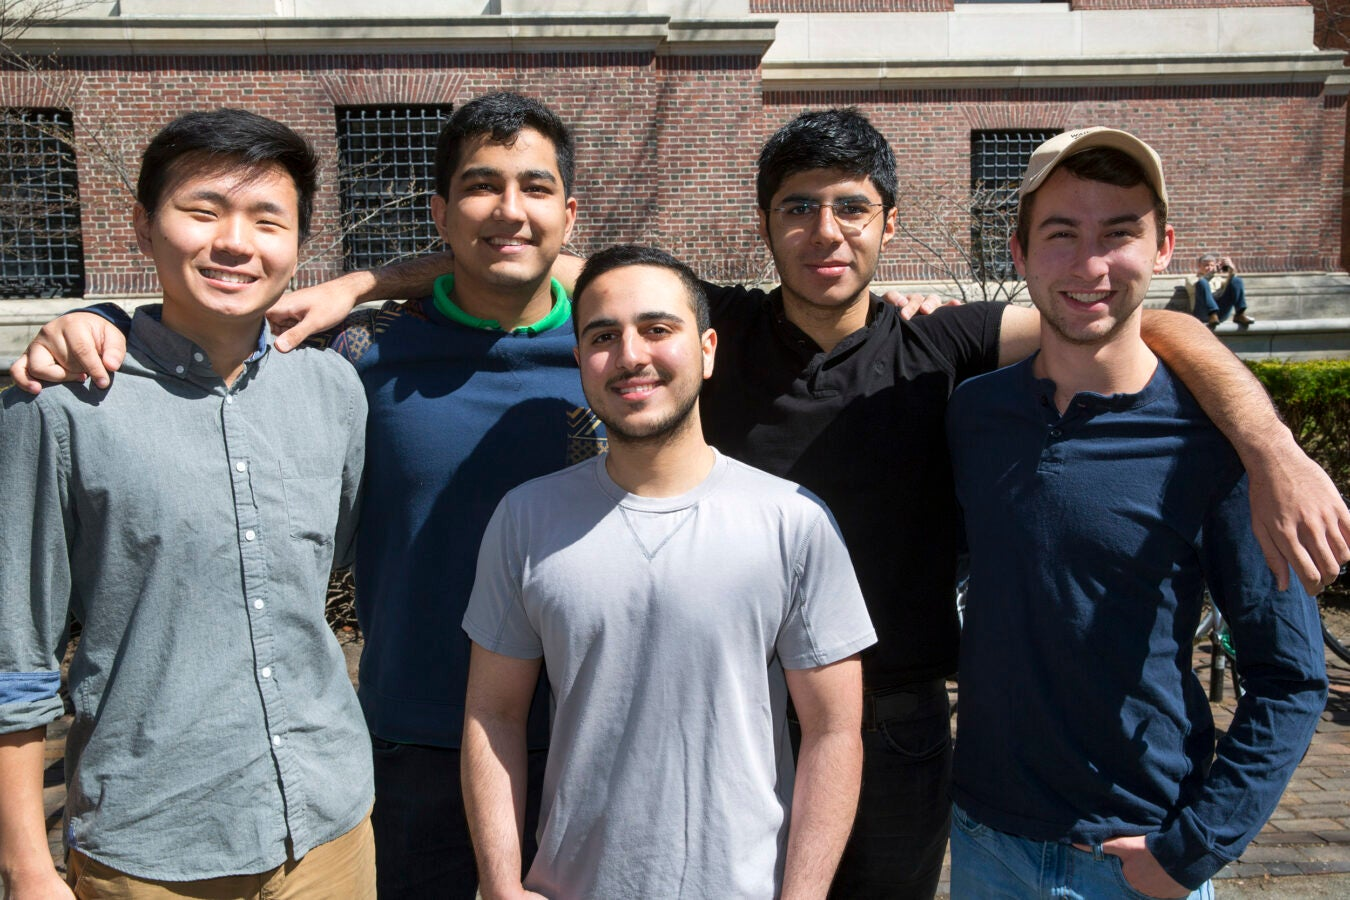 Roommates in Wigglesworth: (l to r) Andrew Cho '20 (AZ), Arpan Sarkar '20 (TN), Michael Shadpour '20 (CA), front, Soheil Sadabadi '20 (Iran), and Scott Kall '20 (MA).